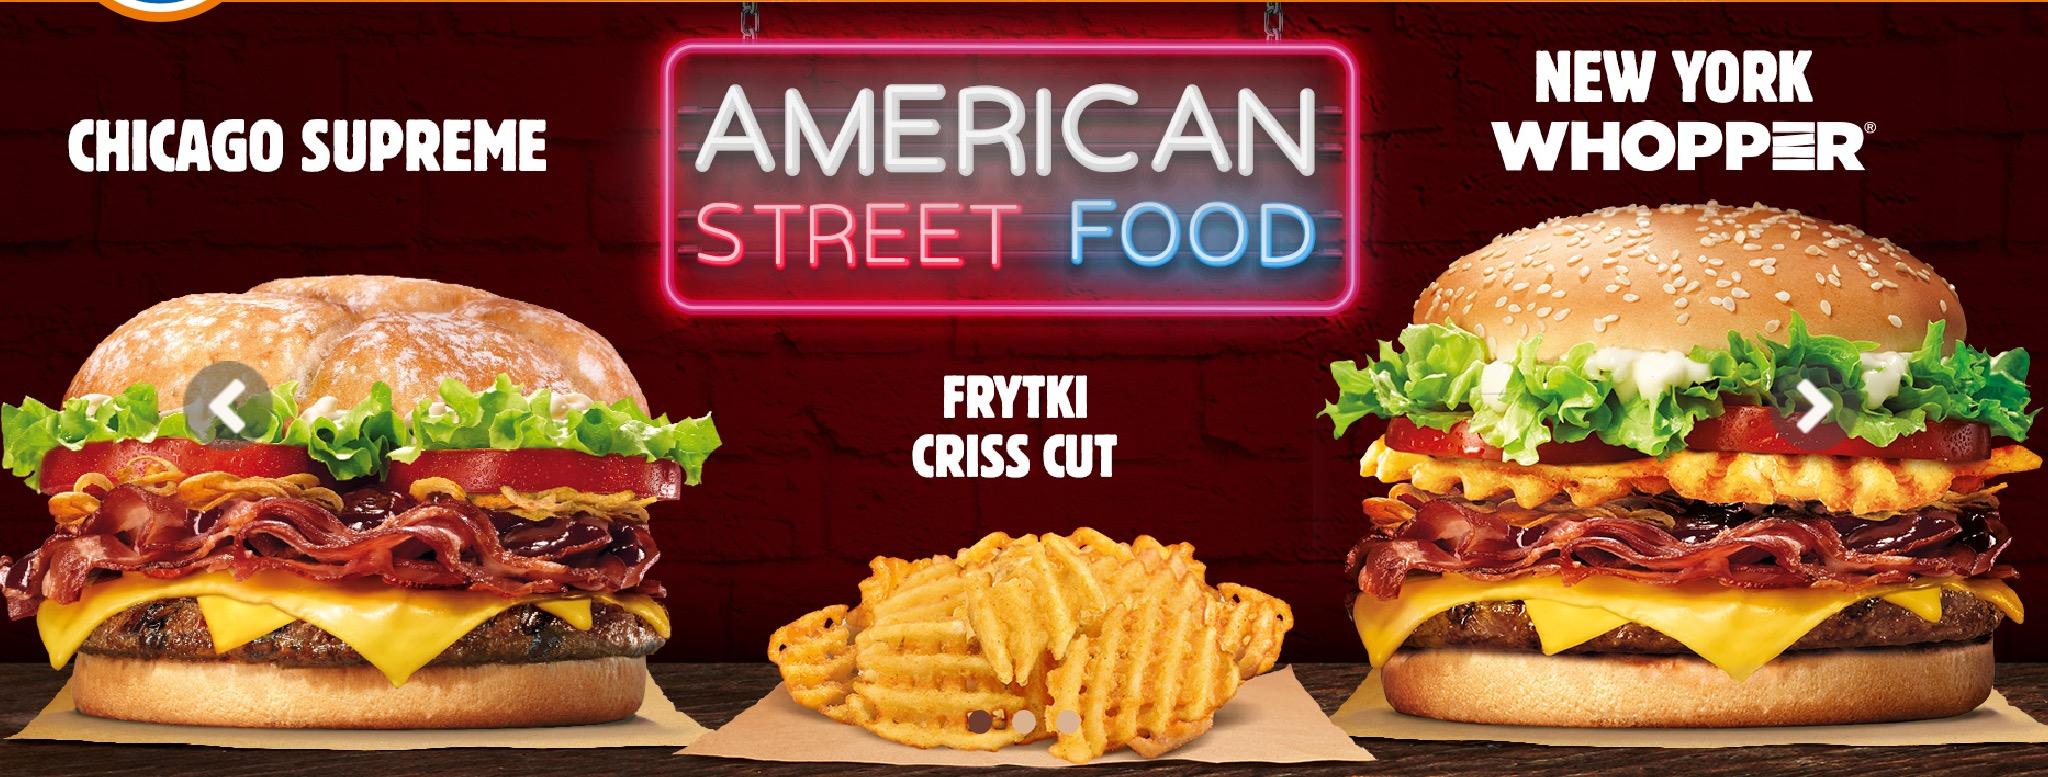 Burger King Poland - American Street Food